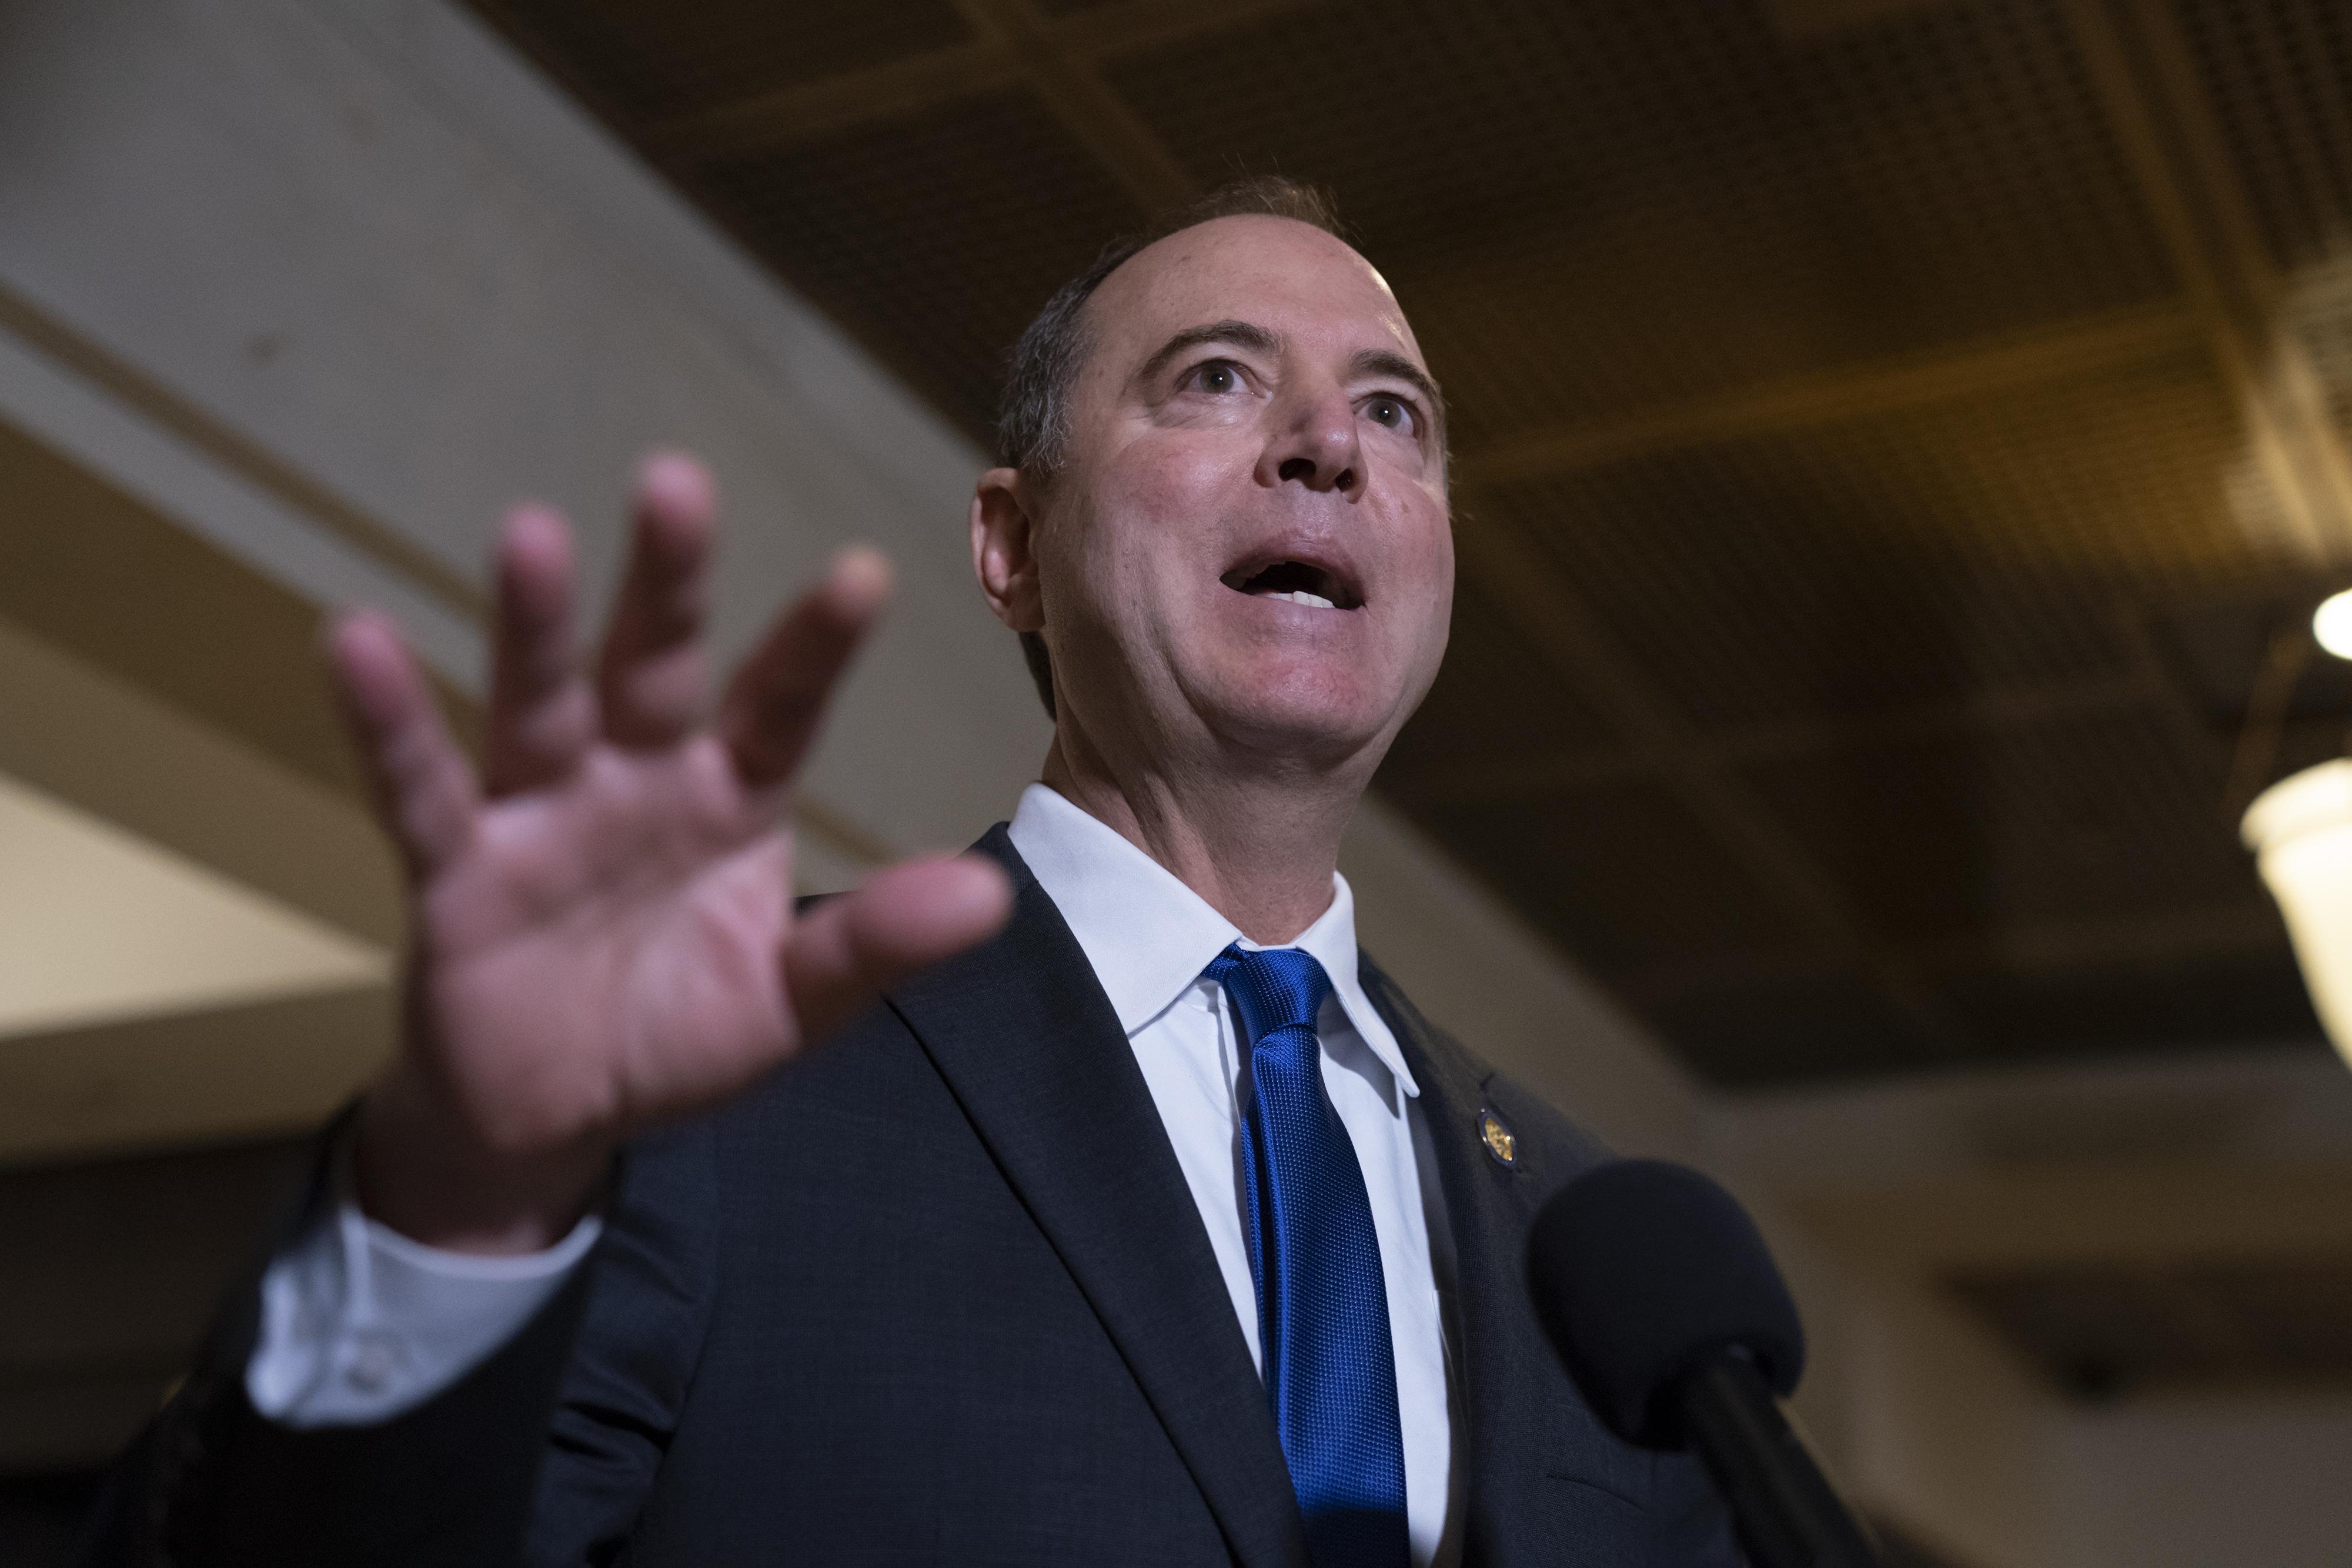 Adam Schiff rejects Hunter Biden, 'whistleblower' as impeachment witnesses